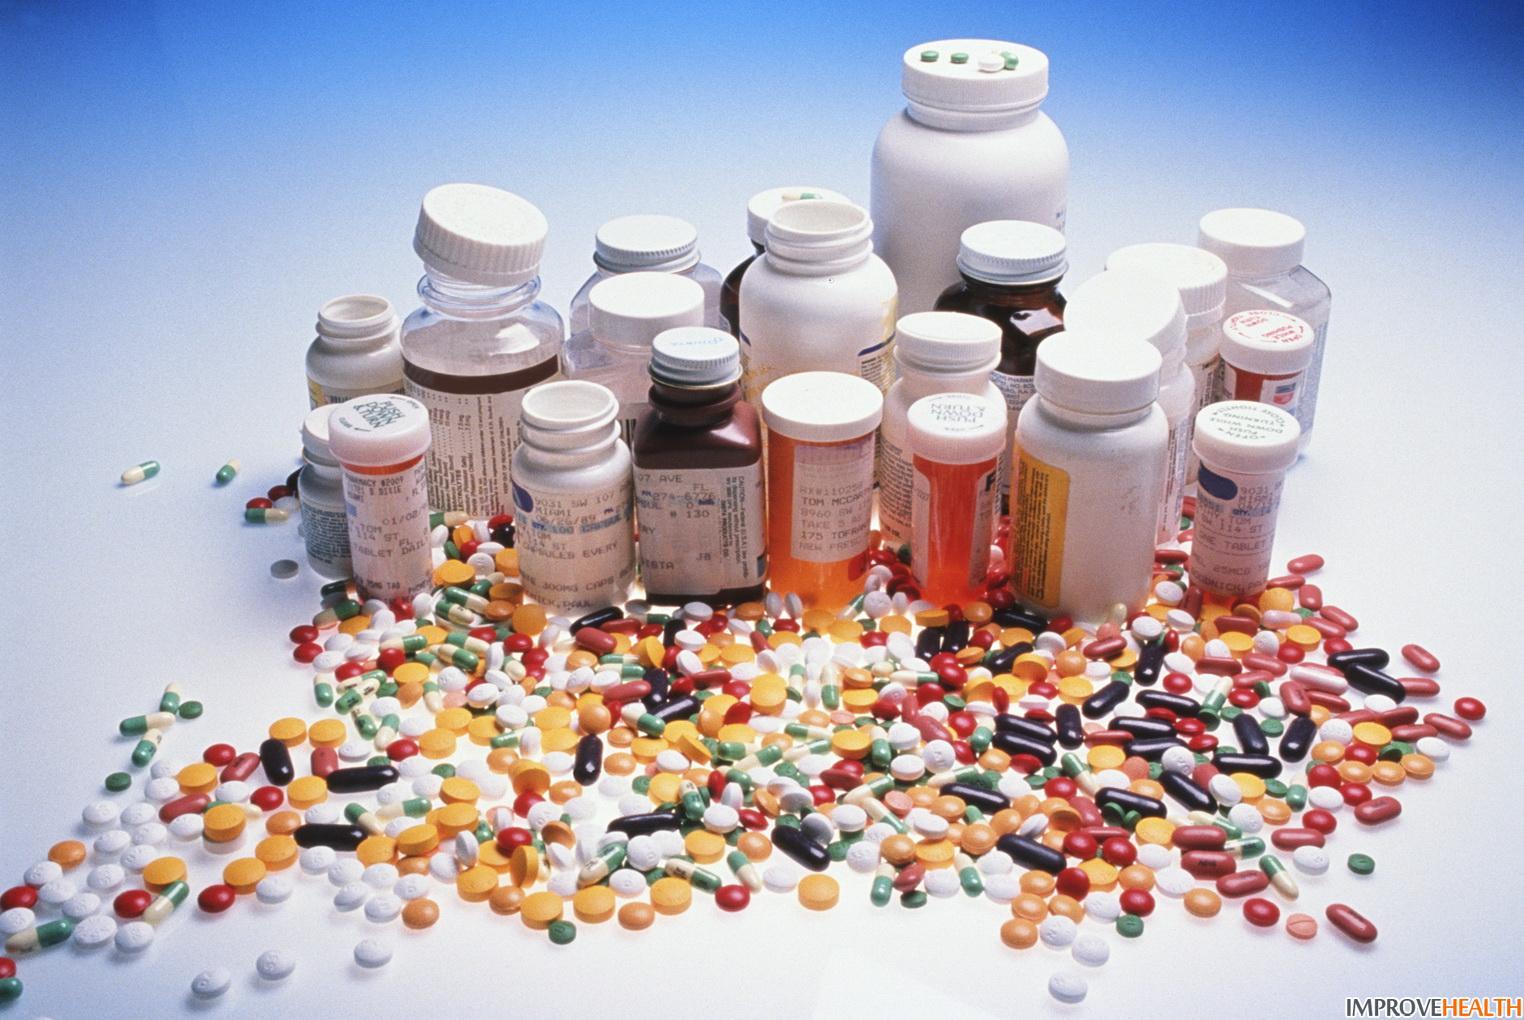 zdorove_medicina_2004.jpg